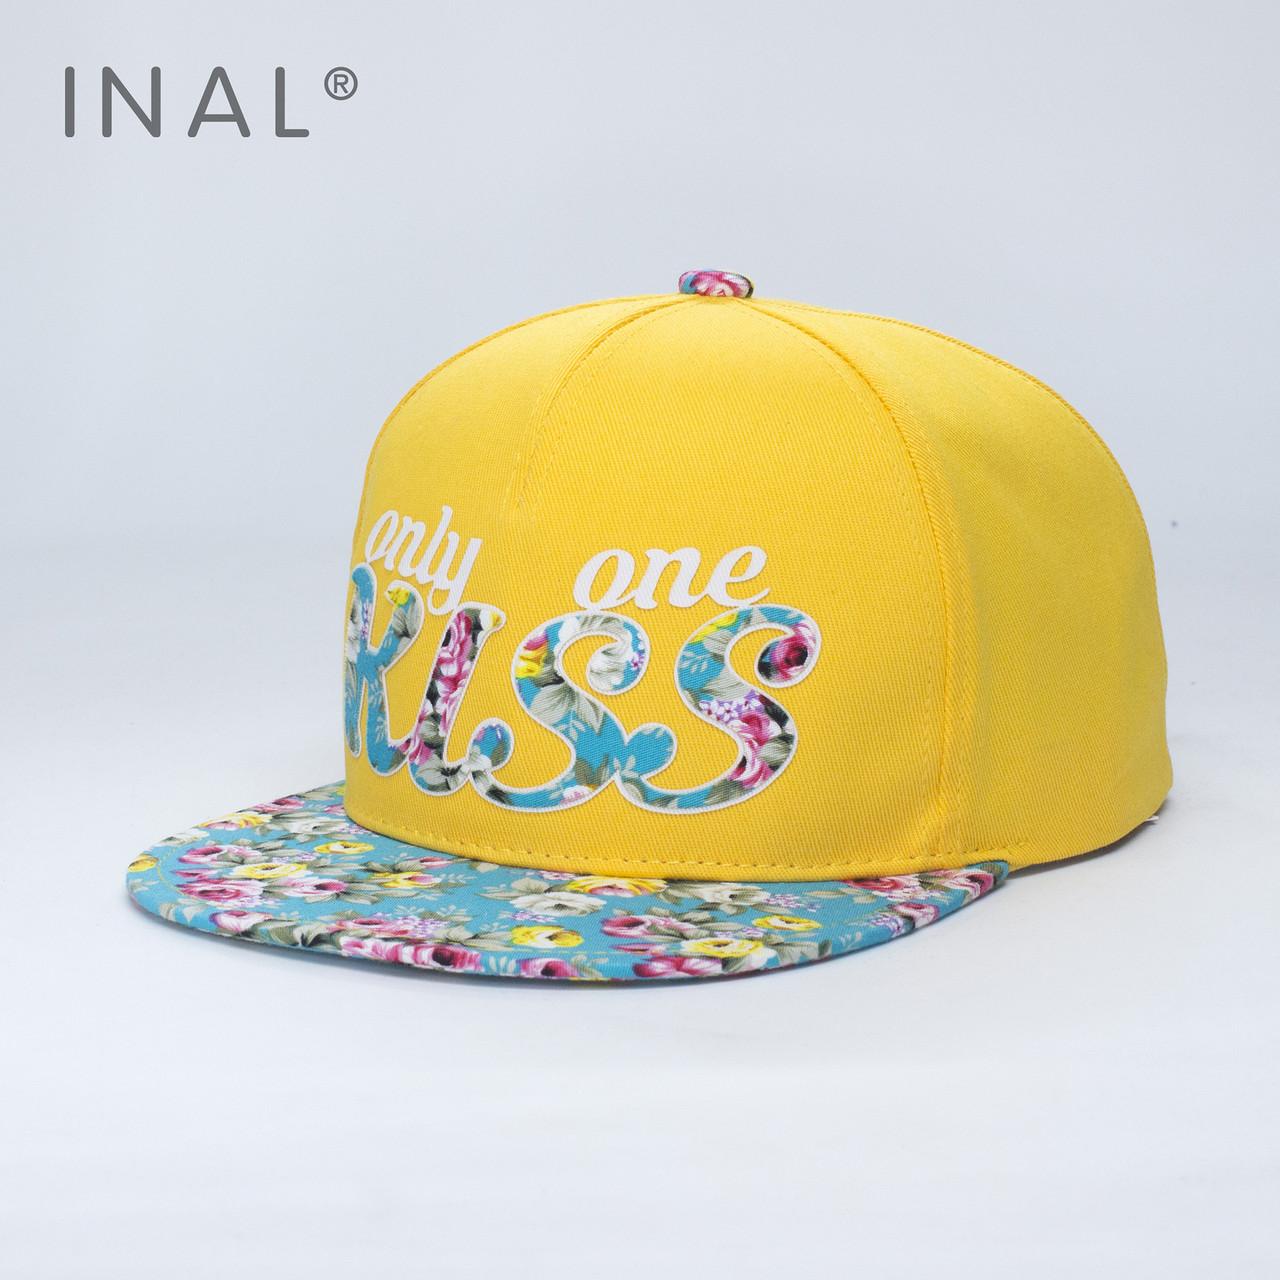 Кепка бейсболка INAL Kiss M / 55-56 RU Желтый 46555